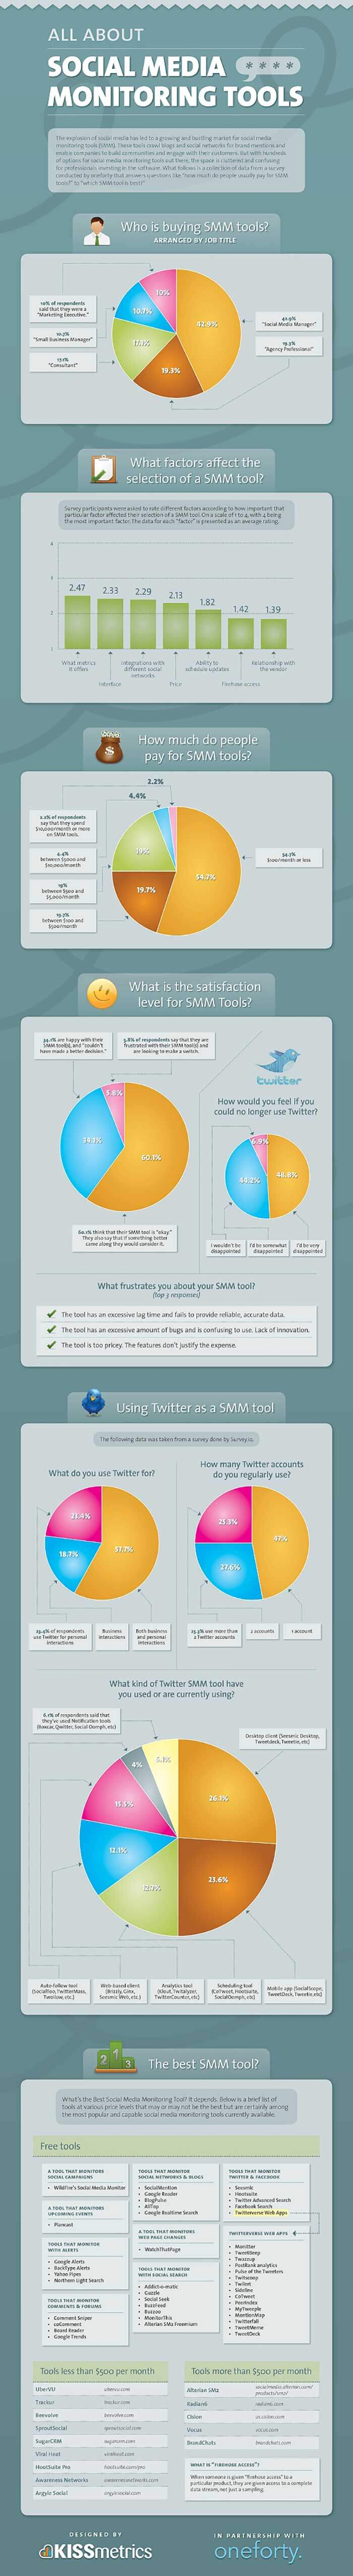 nice piece of infographics courtesy of KISSMetrics